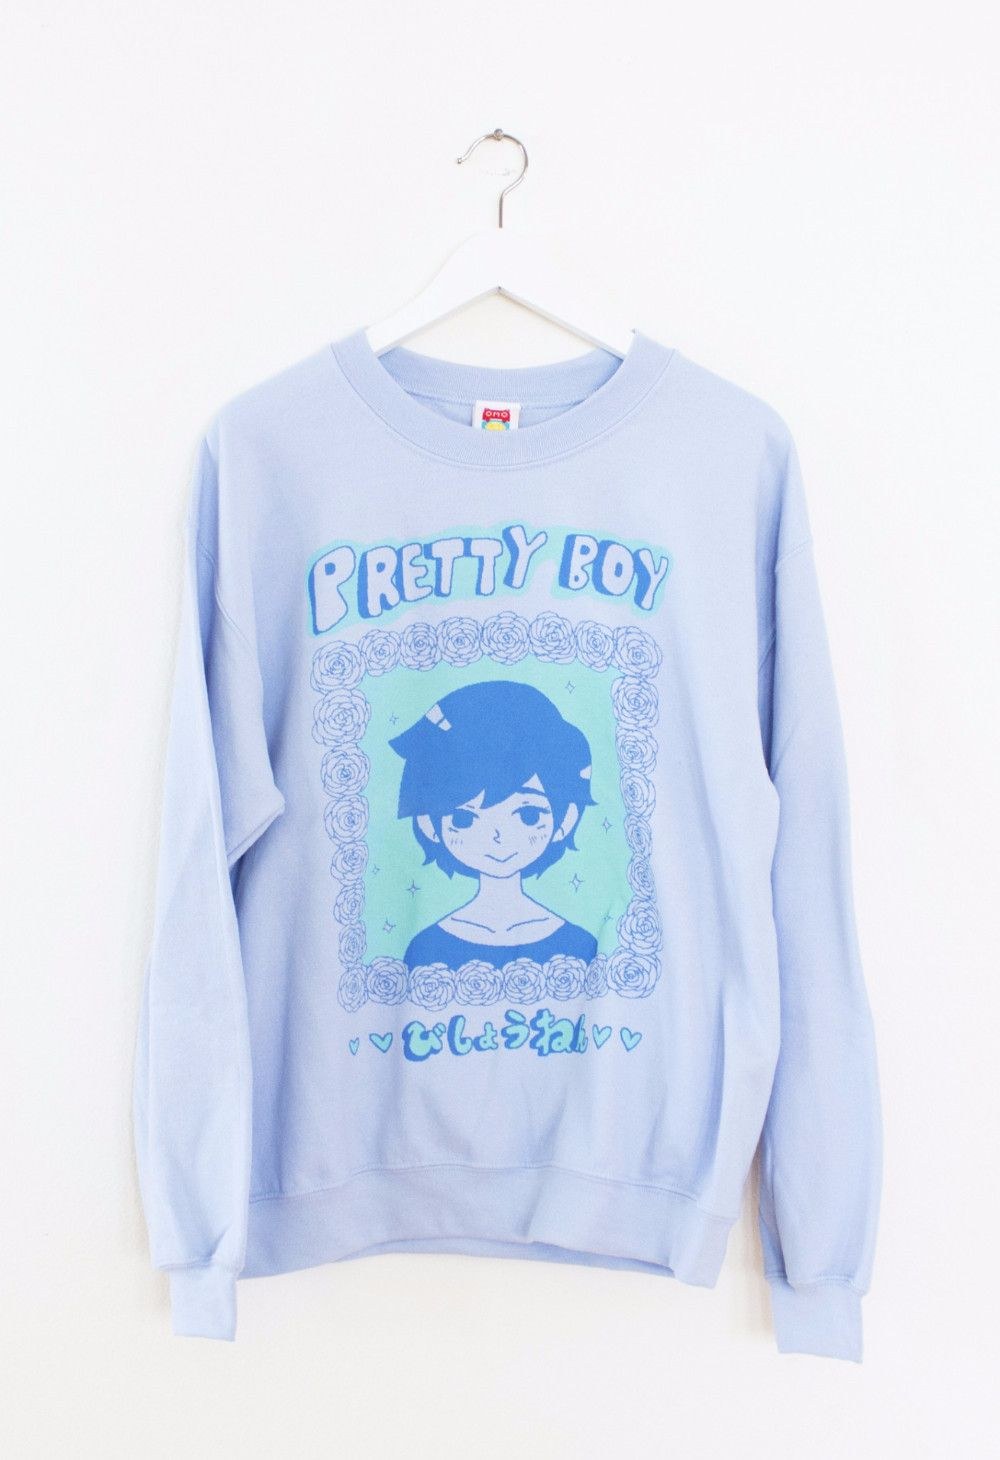 Prettyboy Blue Sweater Des Blue Sweaters Pastel